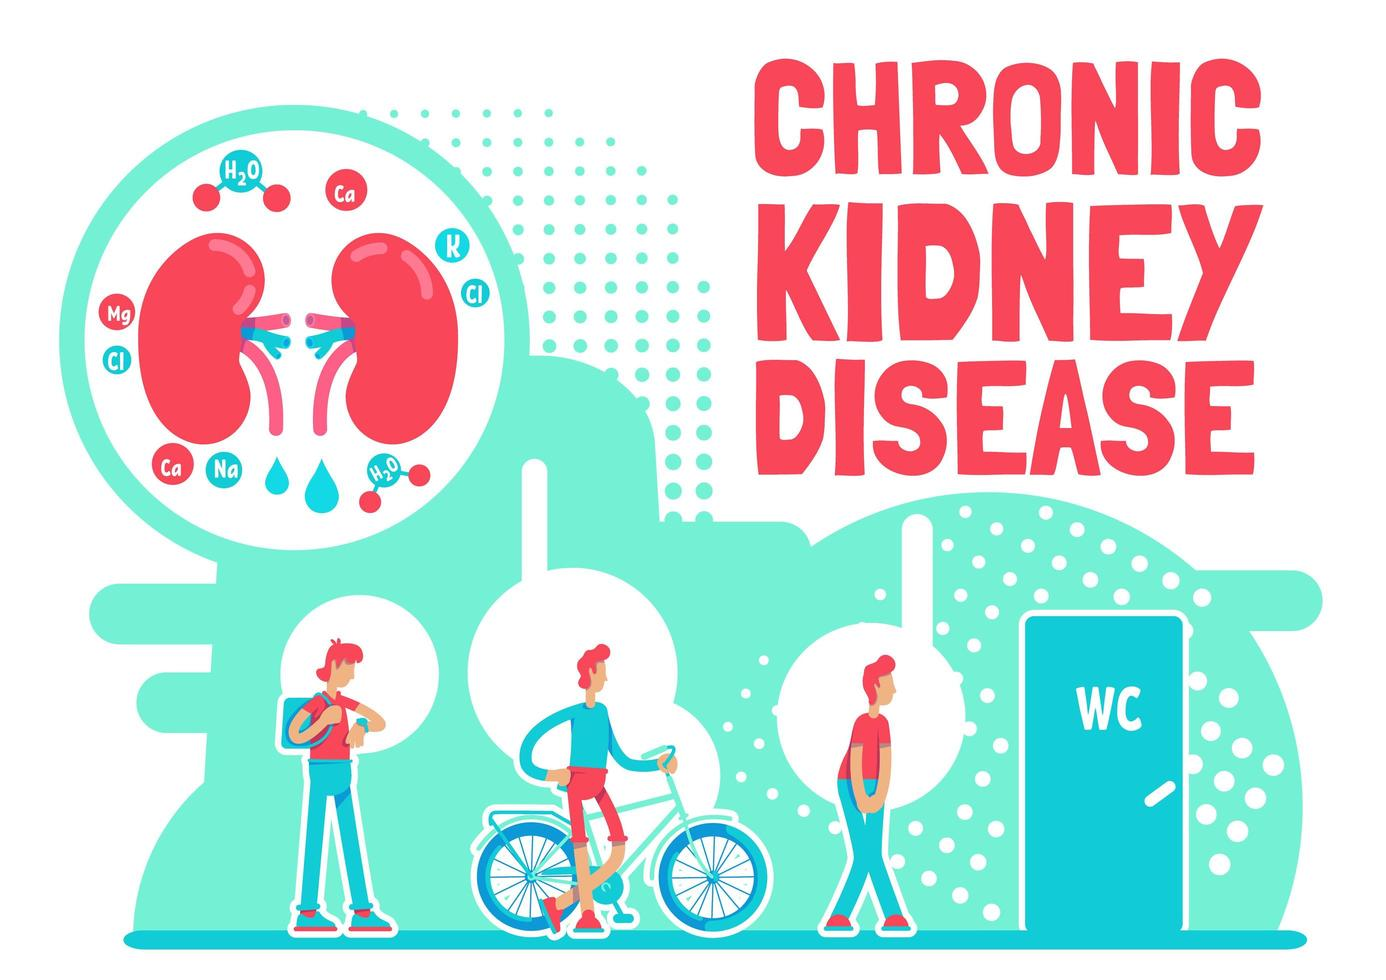 affisch med kronisk njursjukdom vektor